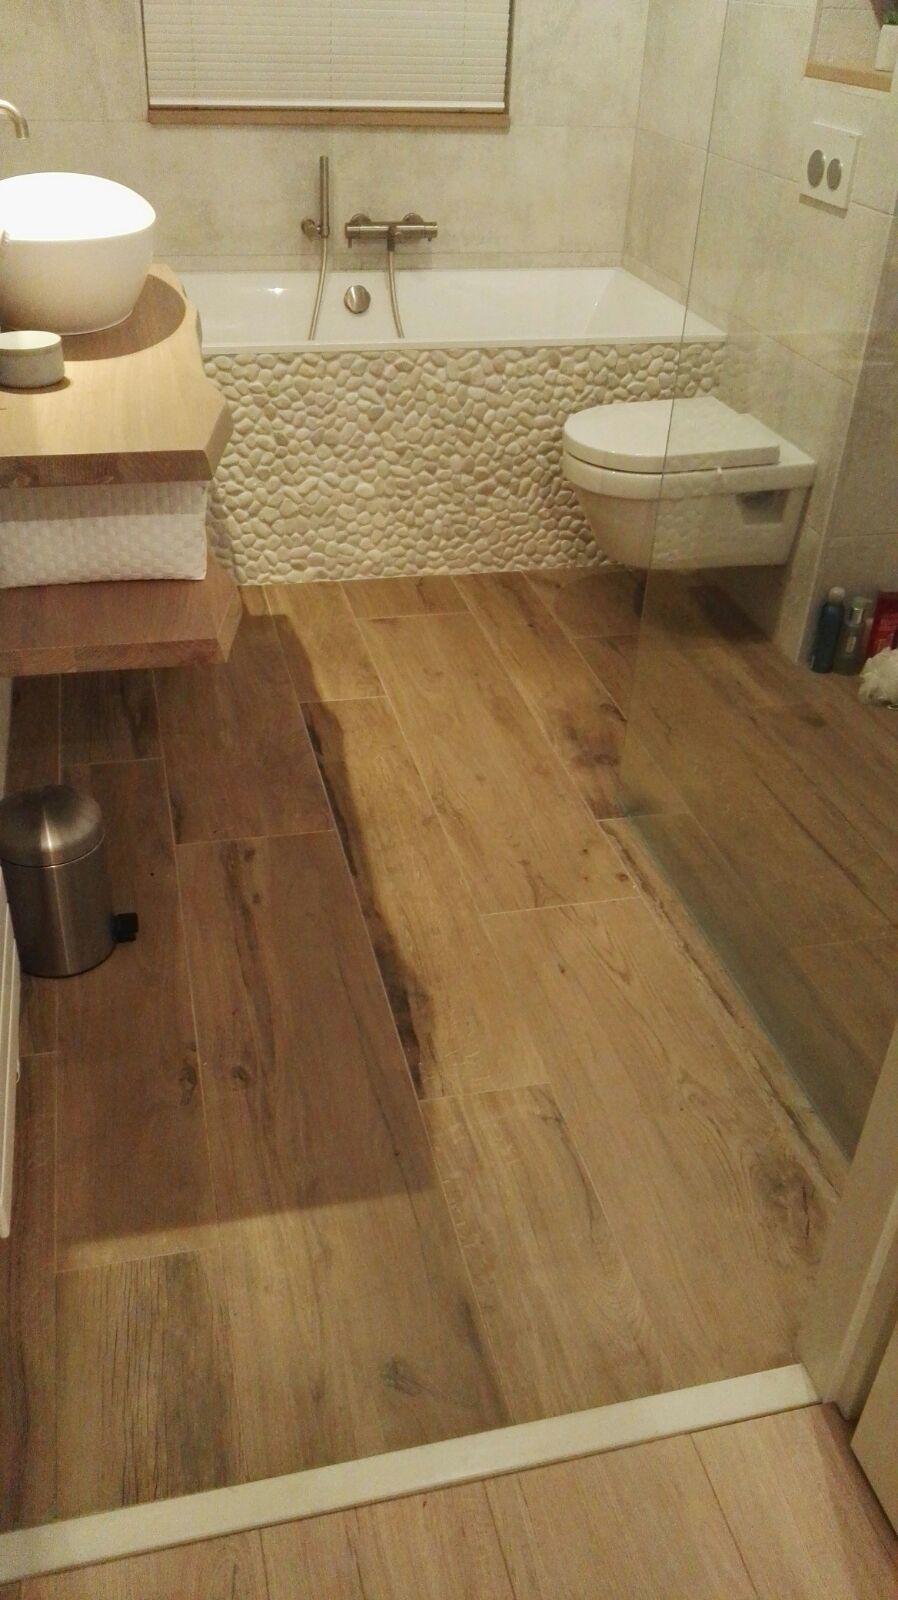 Badkamer tegels keramisch parket Emil oak | Badkamer tegels | Pinterest